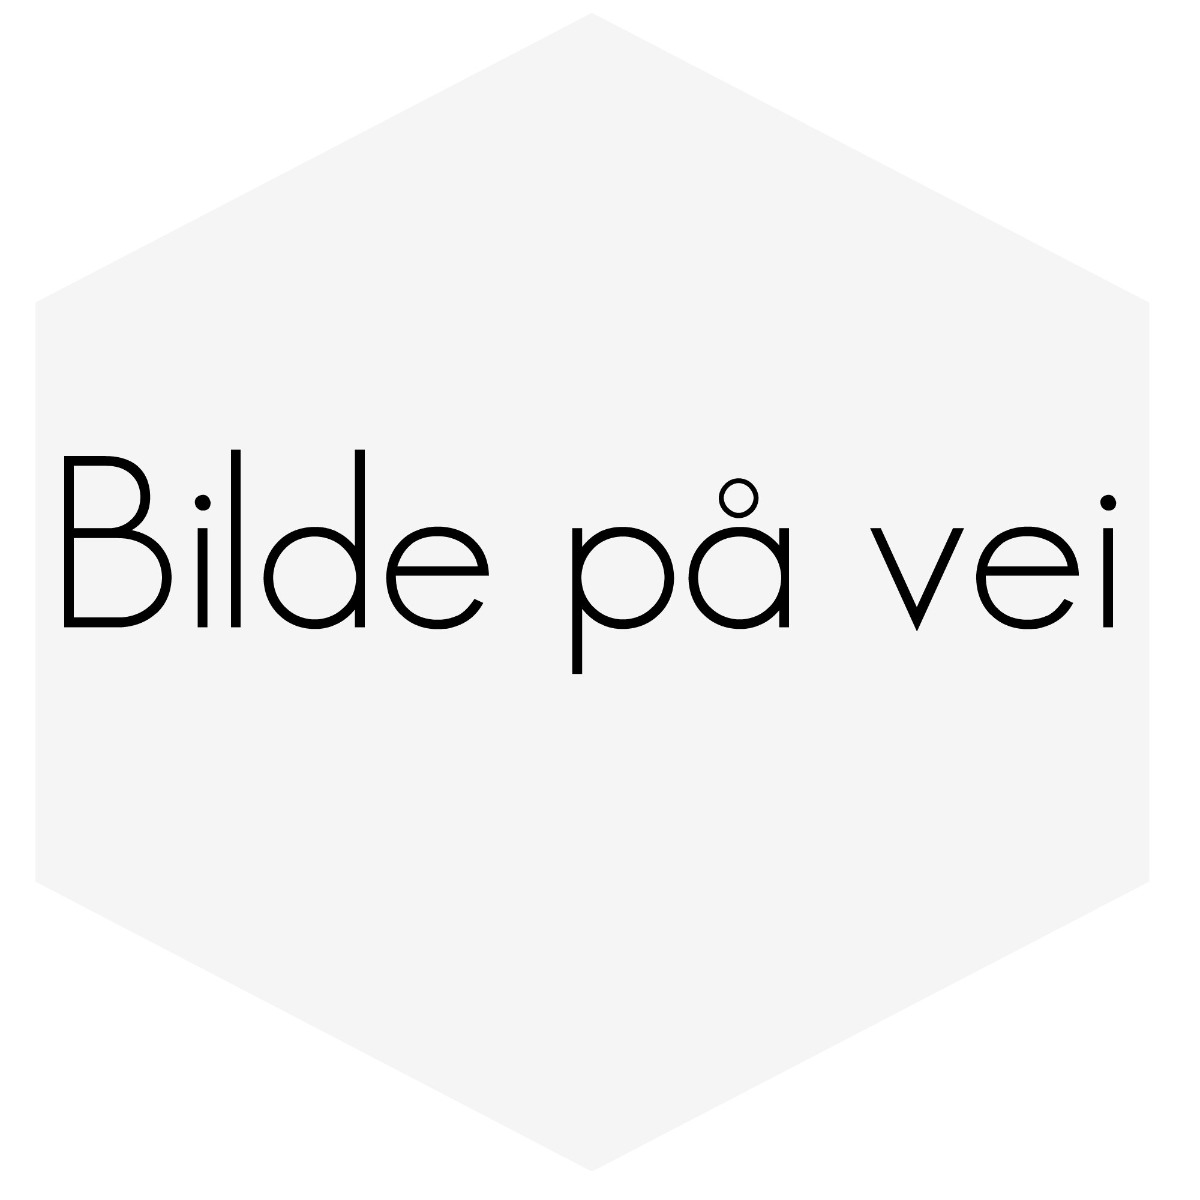 BCB GRÅ T-SKJORTE M/VÅR FINE TEGNING MED VOLVO FORAN